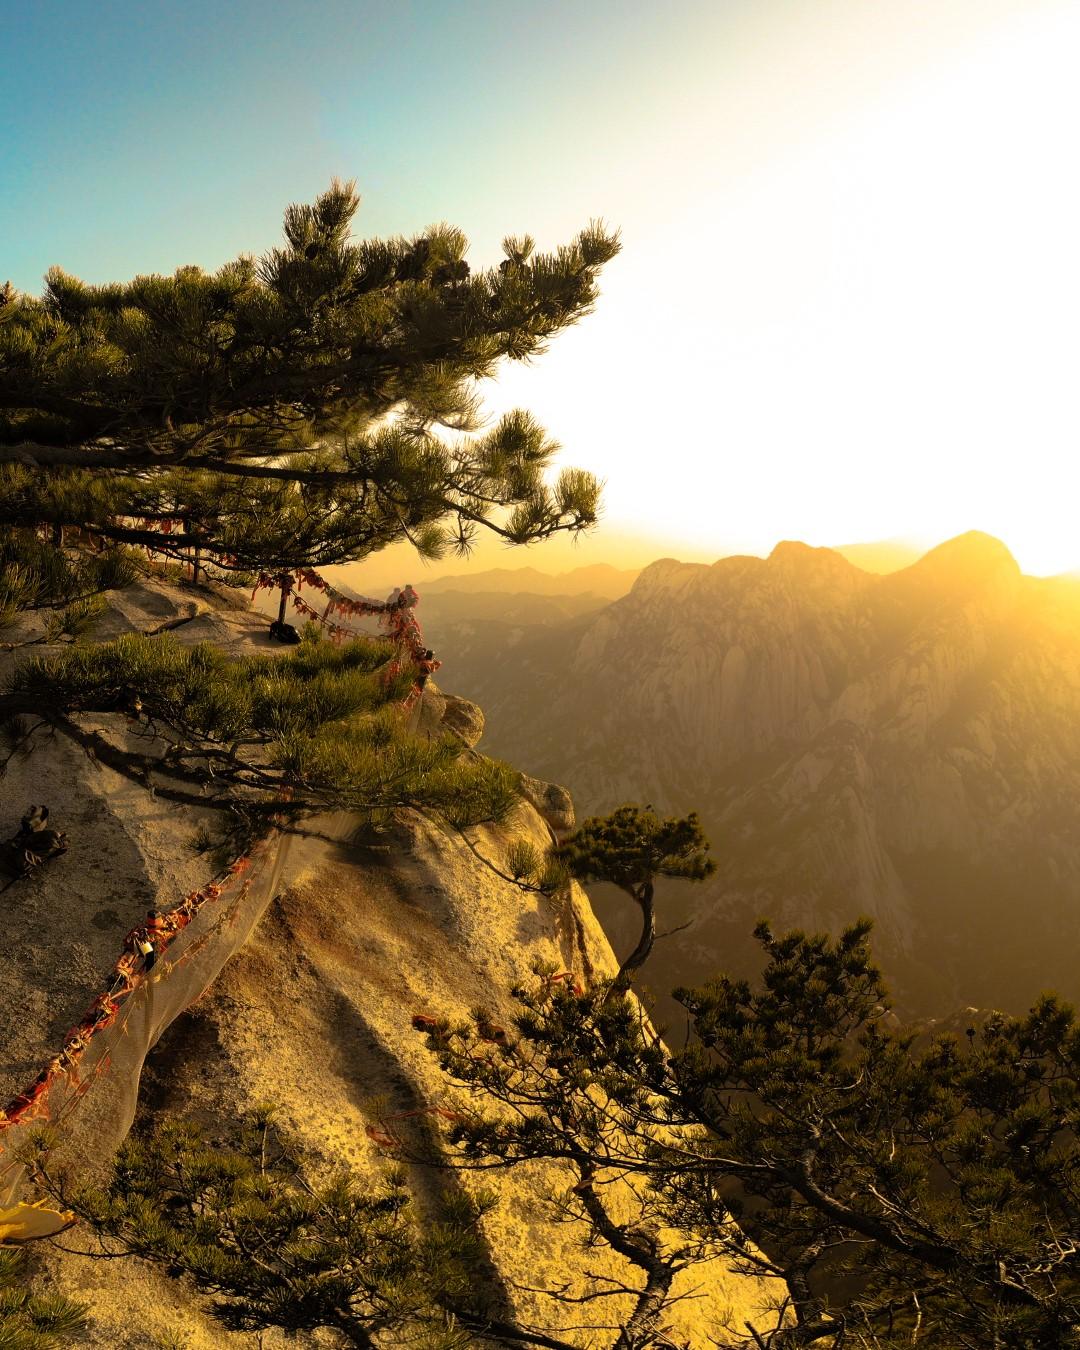 Hua Shan Mountain Mavic Air Pano